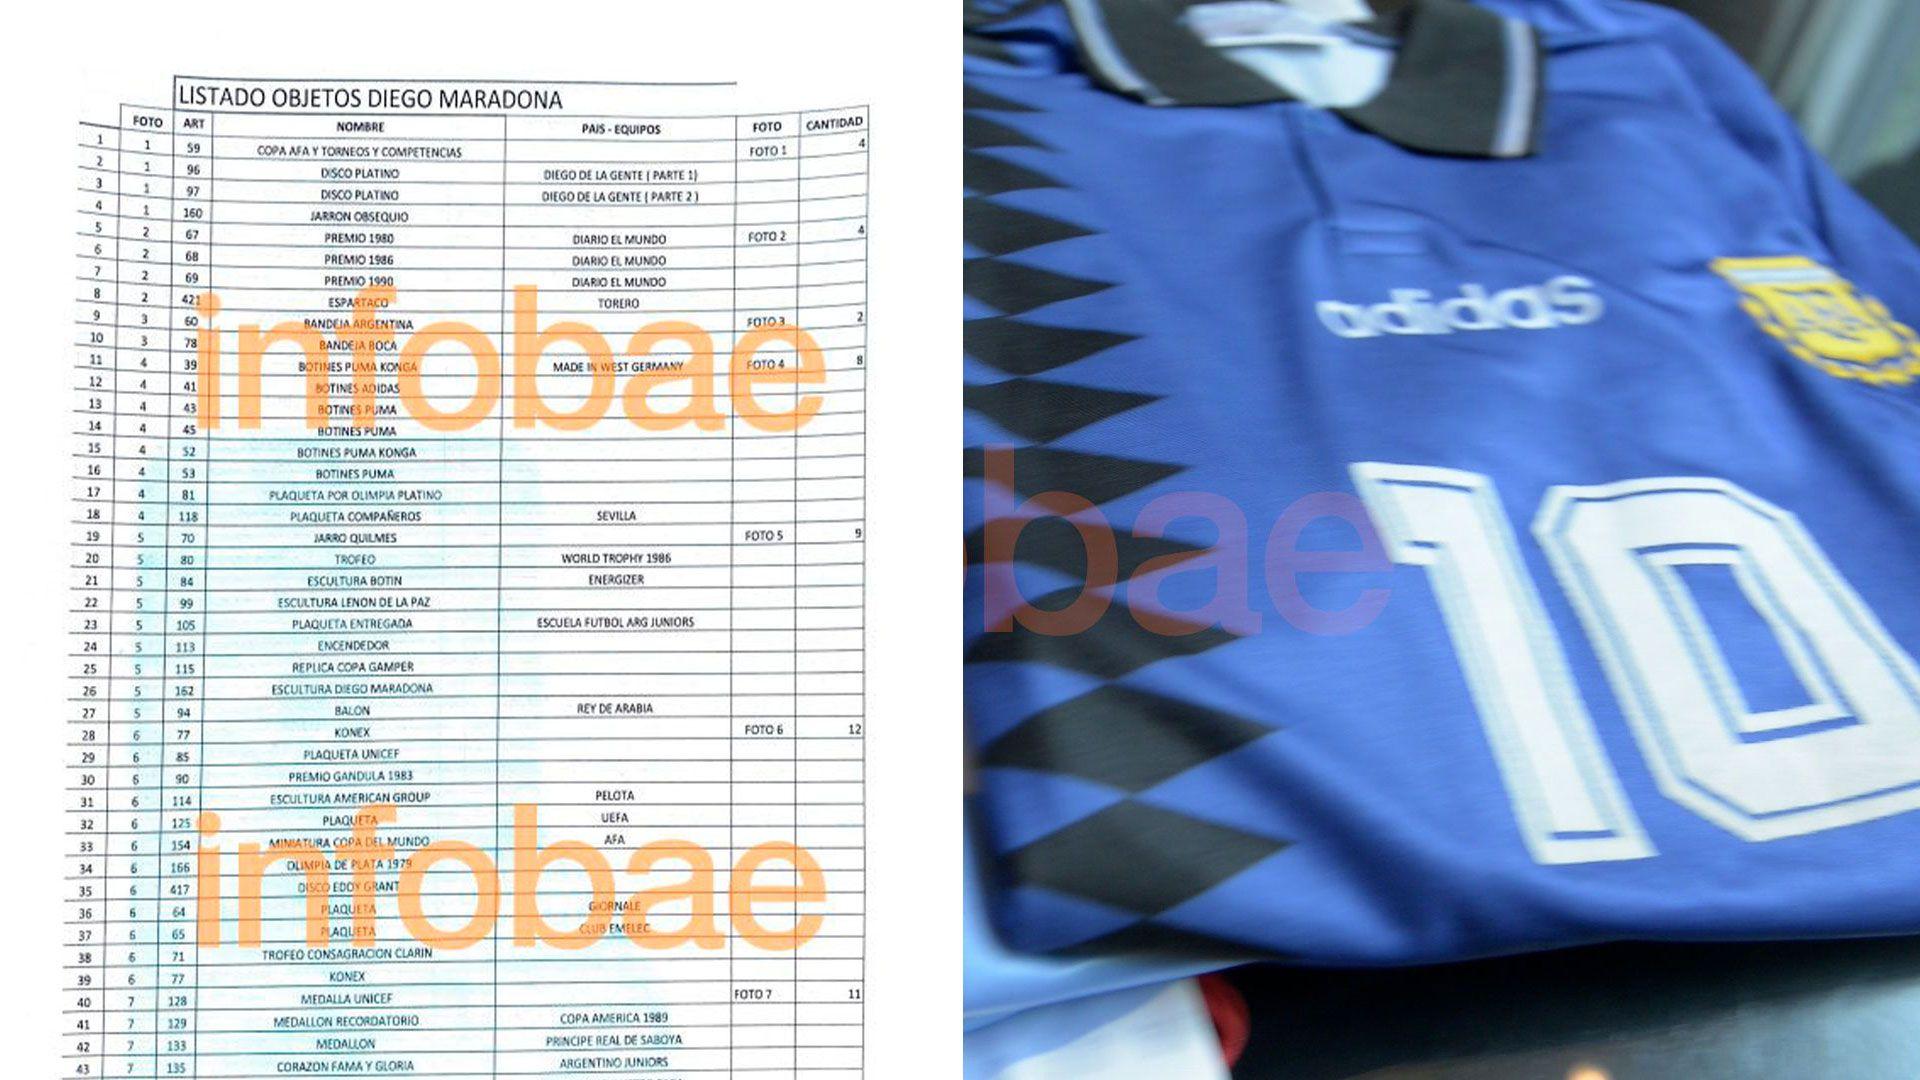 las camisetas de Maradona en disputa